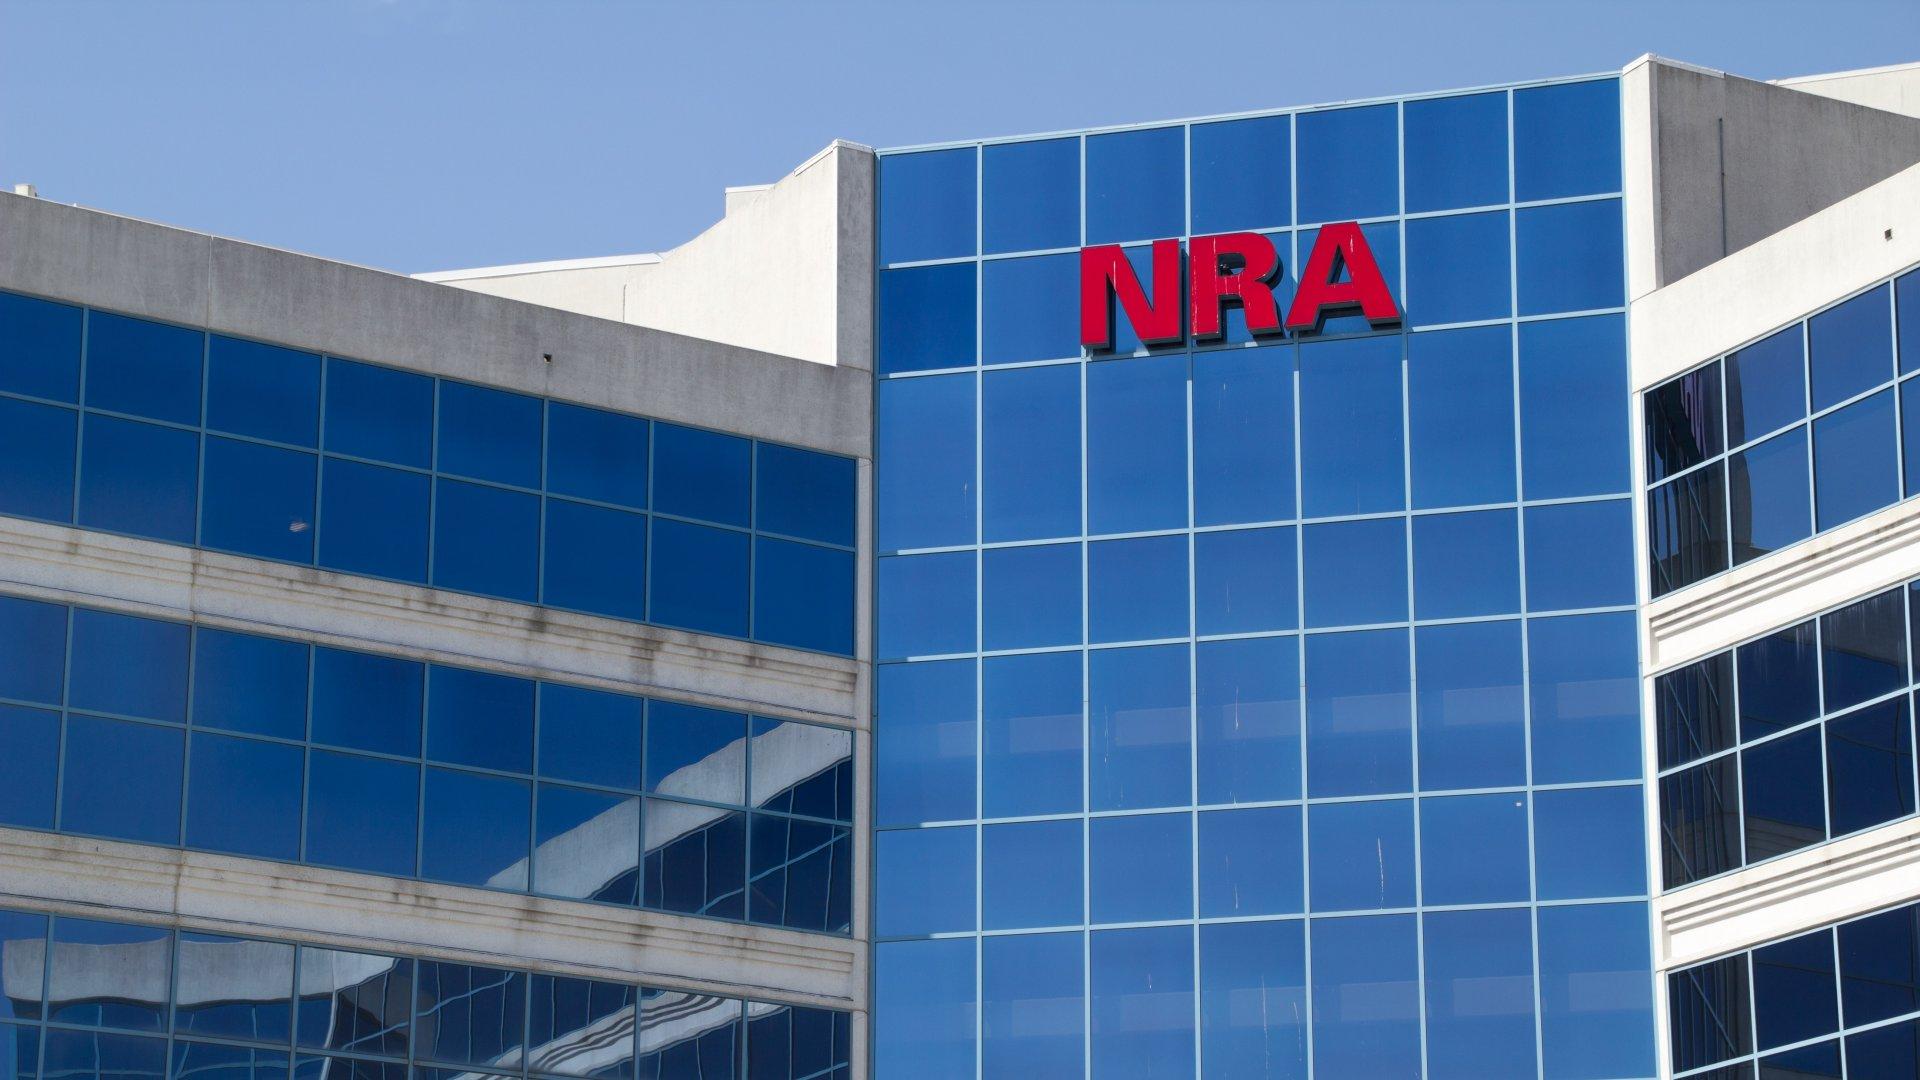 Fairfax, Virginia, USA - April 05,2013: The National Rifle Association headquarters building is located near Washington, DC.